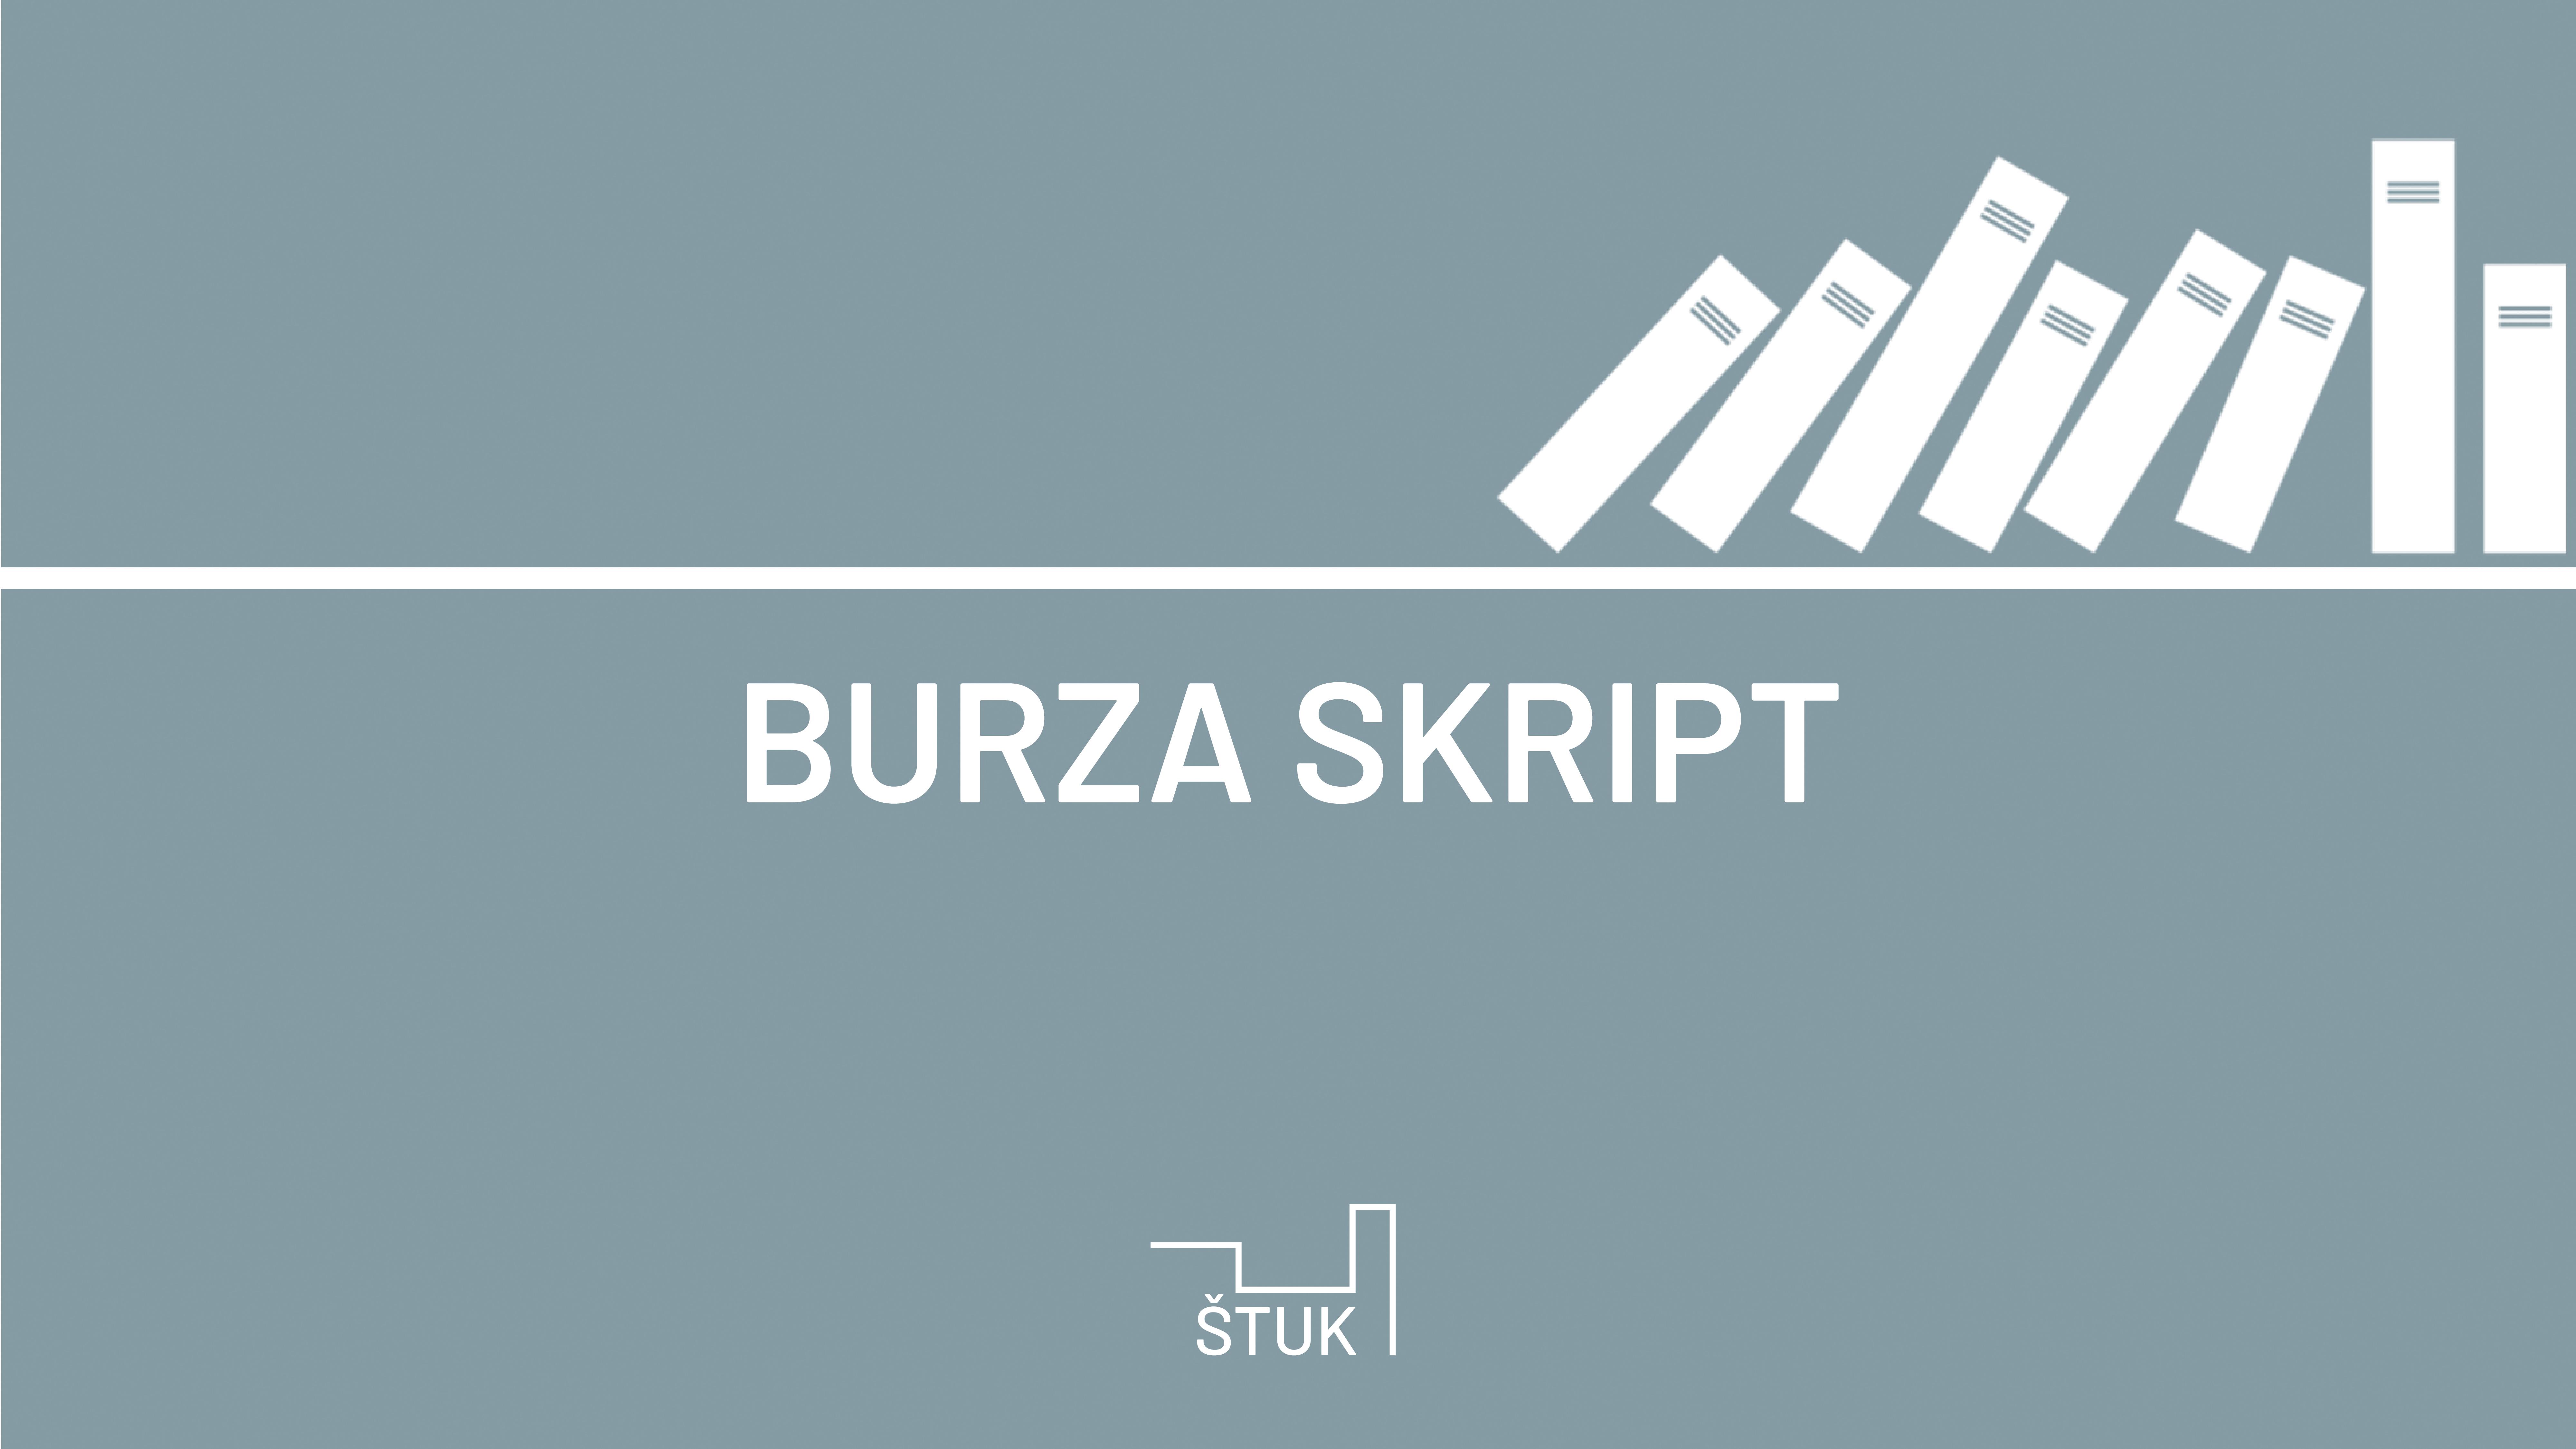 AKTUÁLNĚ: Burza skript a materiálu